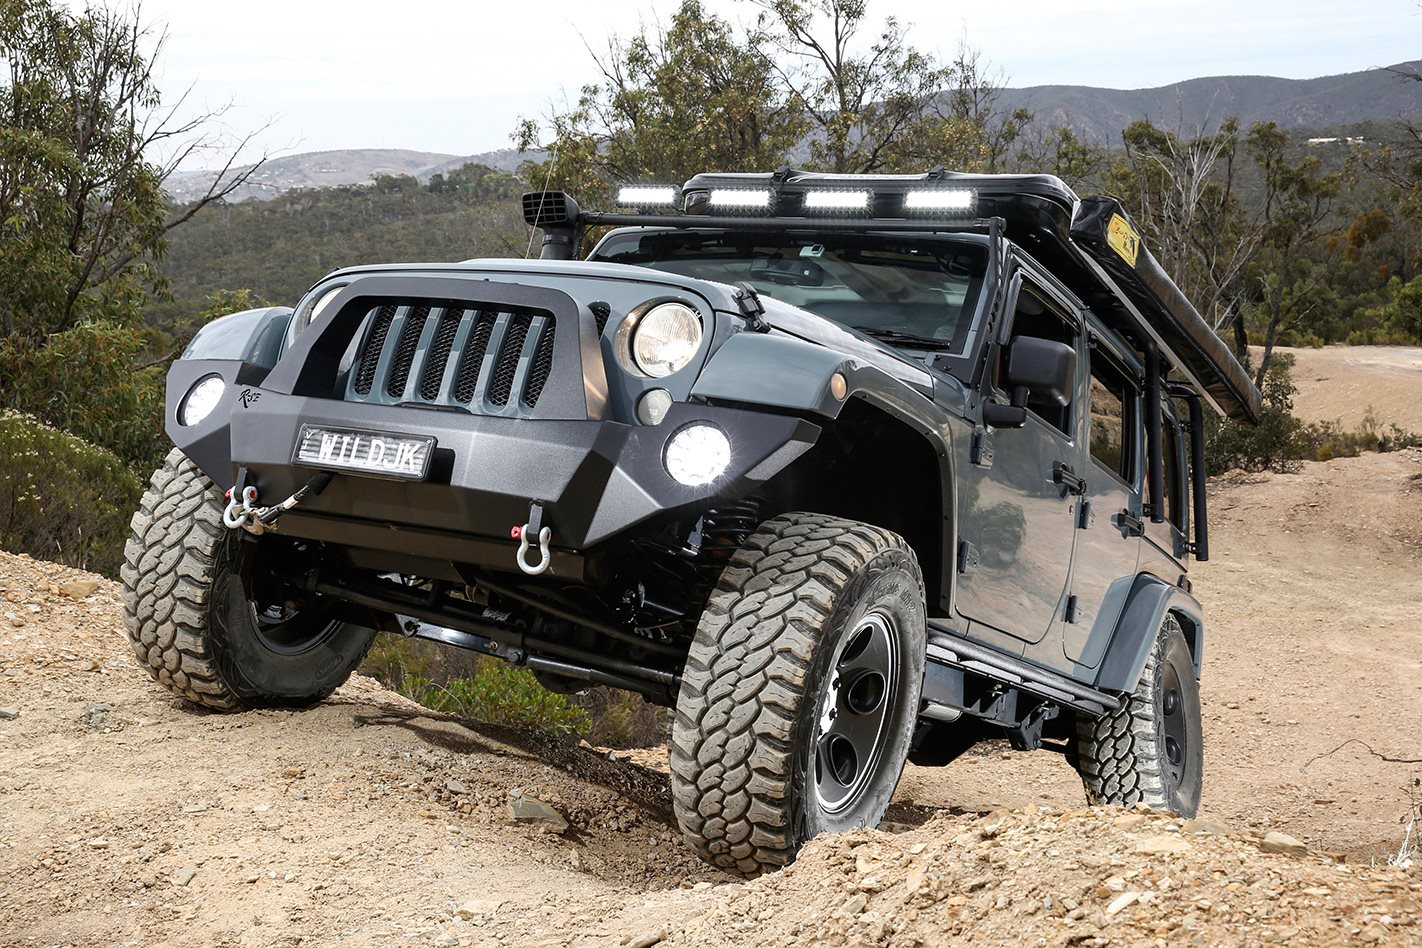 custom 4x4 jeep jk wrangler rubicon 4x4 australia. Black Bedroom Furniture Sets. Home Design Ideas